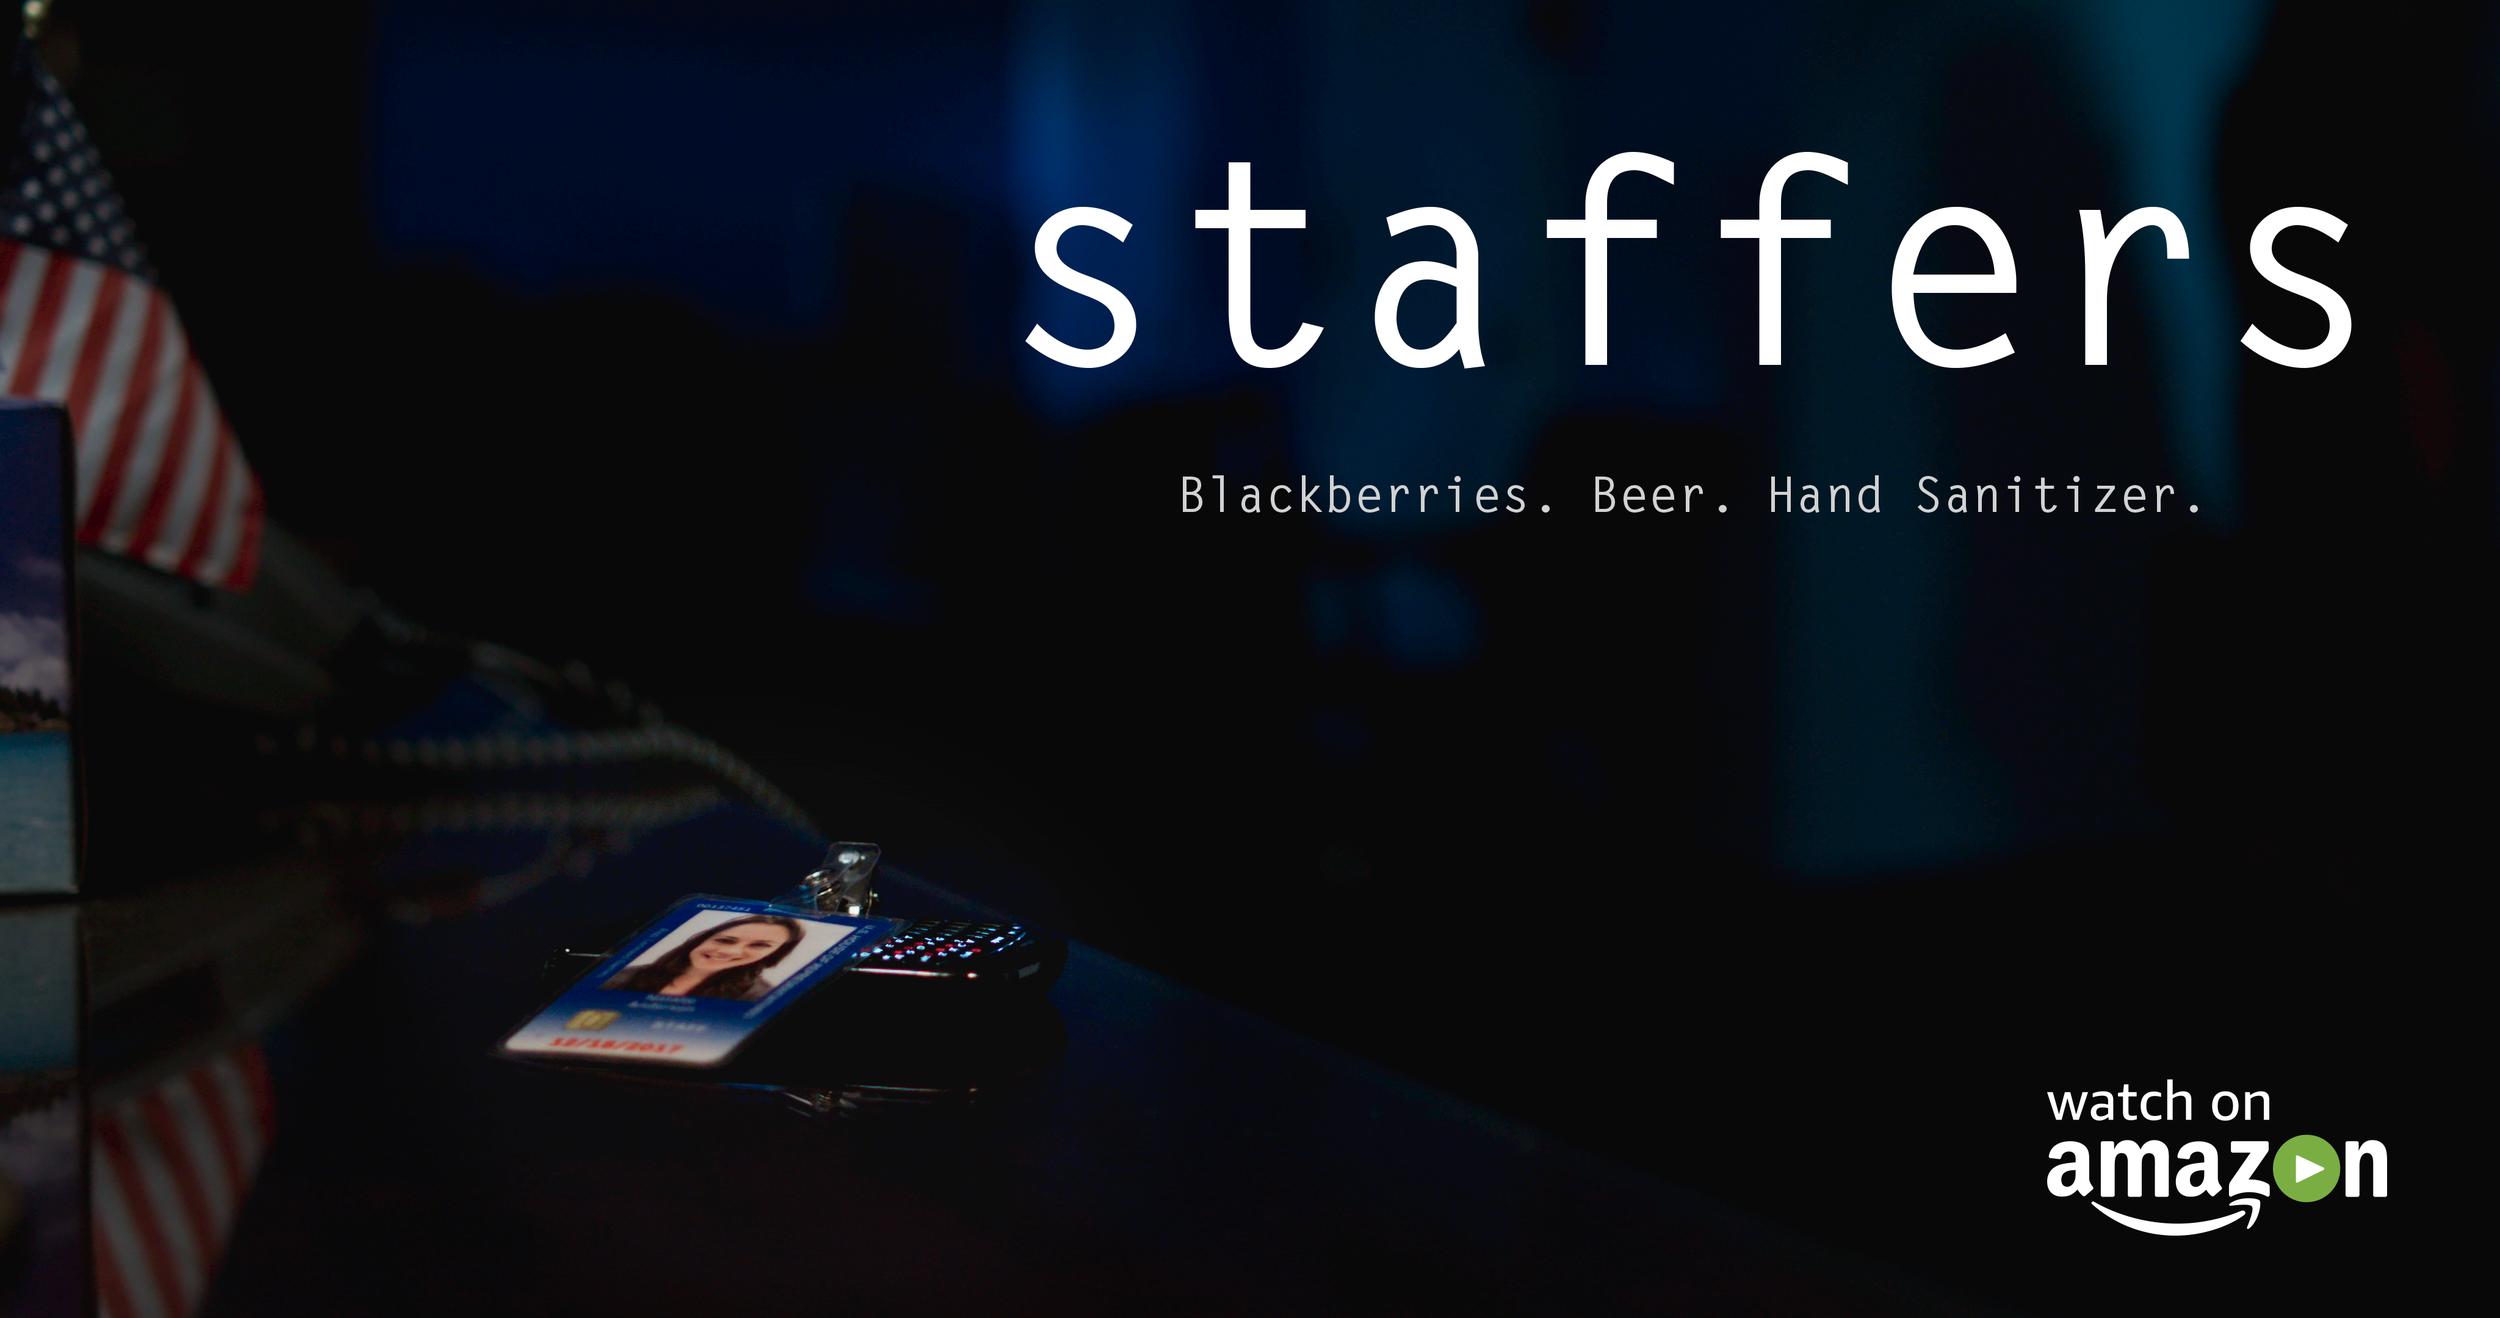 Staffers_Badge_Phone_KeysLit.png